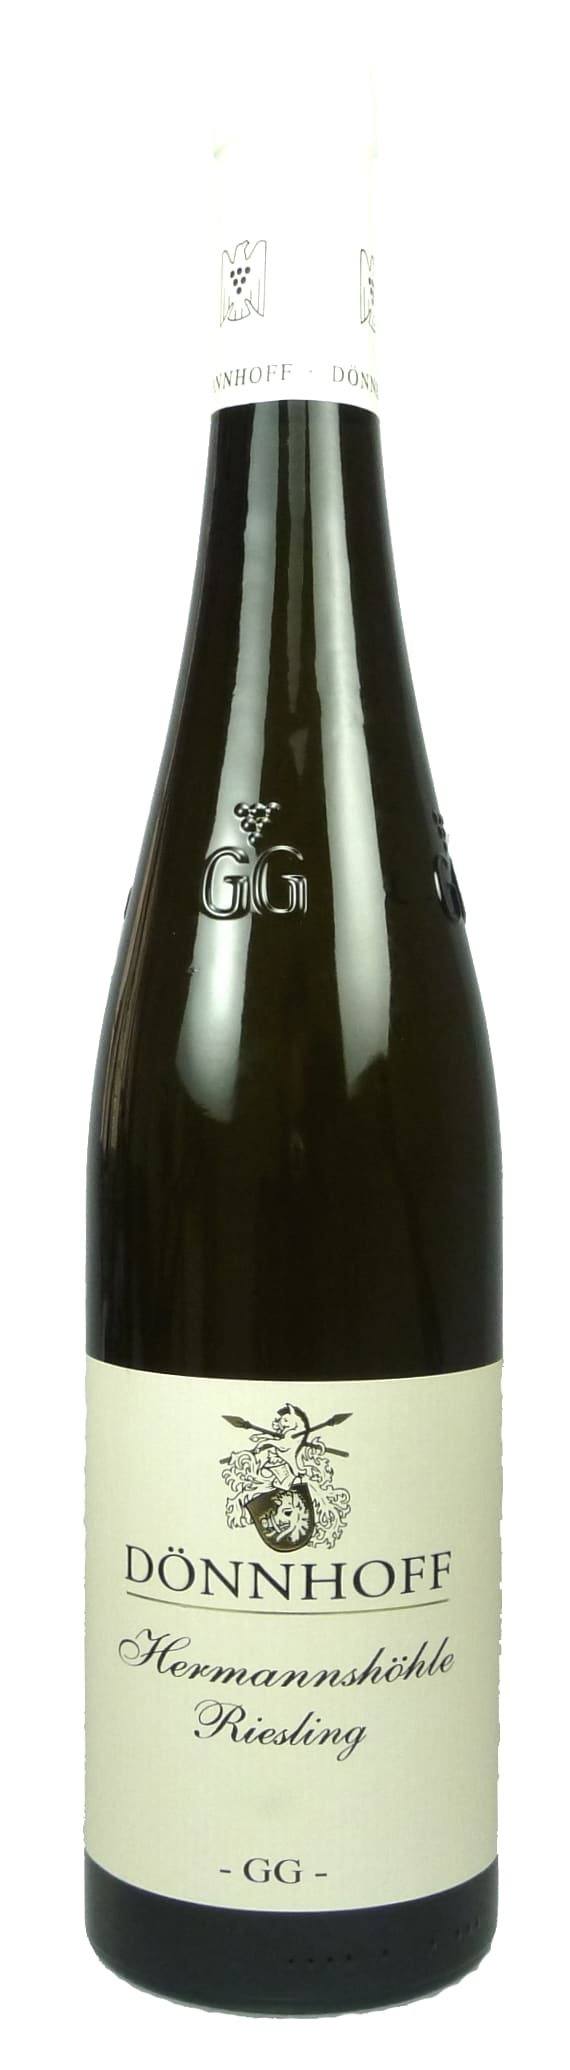 Hermannshöhle Riesling Großes Gewächs Qualitätswein trocken 2016